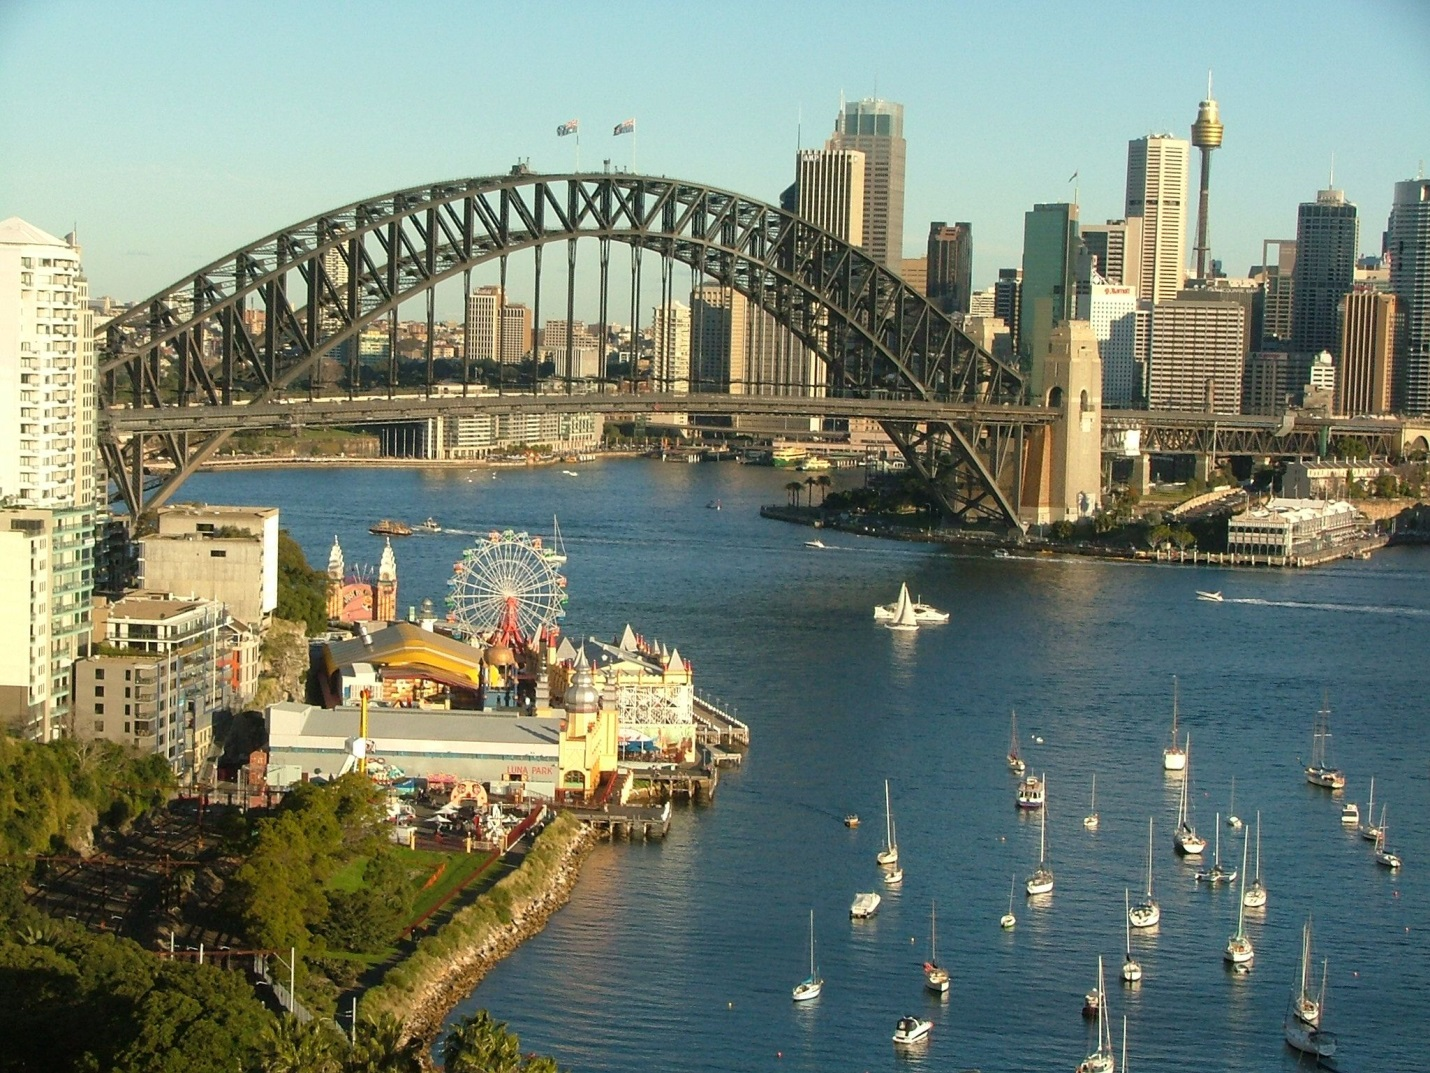 rentalcars24h blog sydney park1 #1 Sydney Sight To Admire Australian Nature!